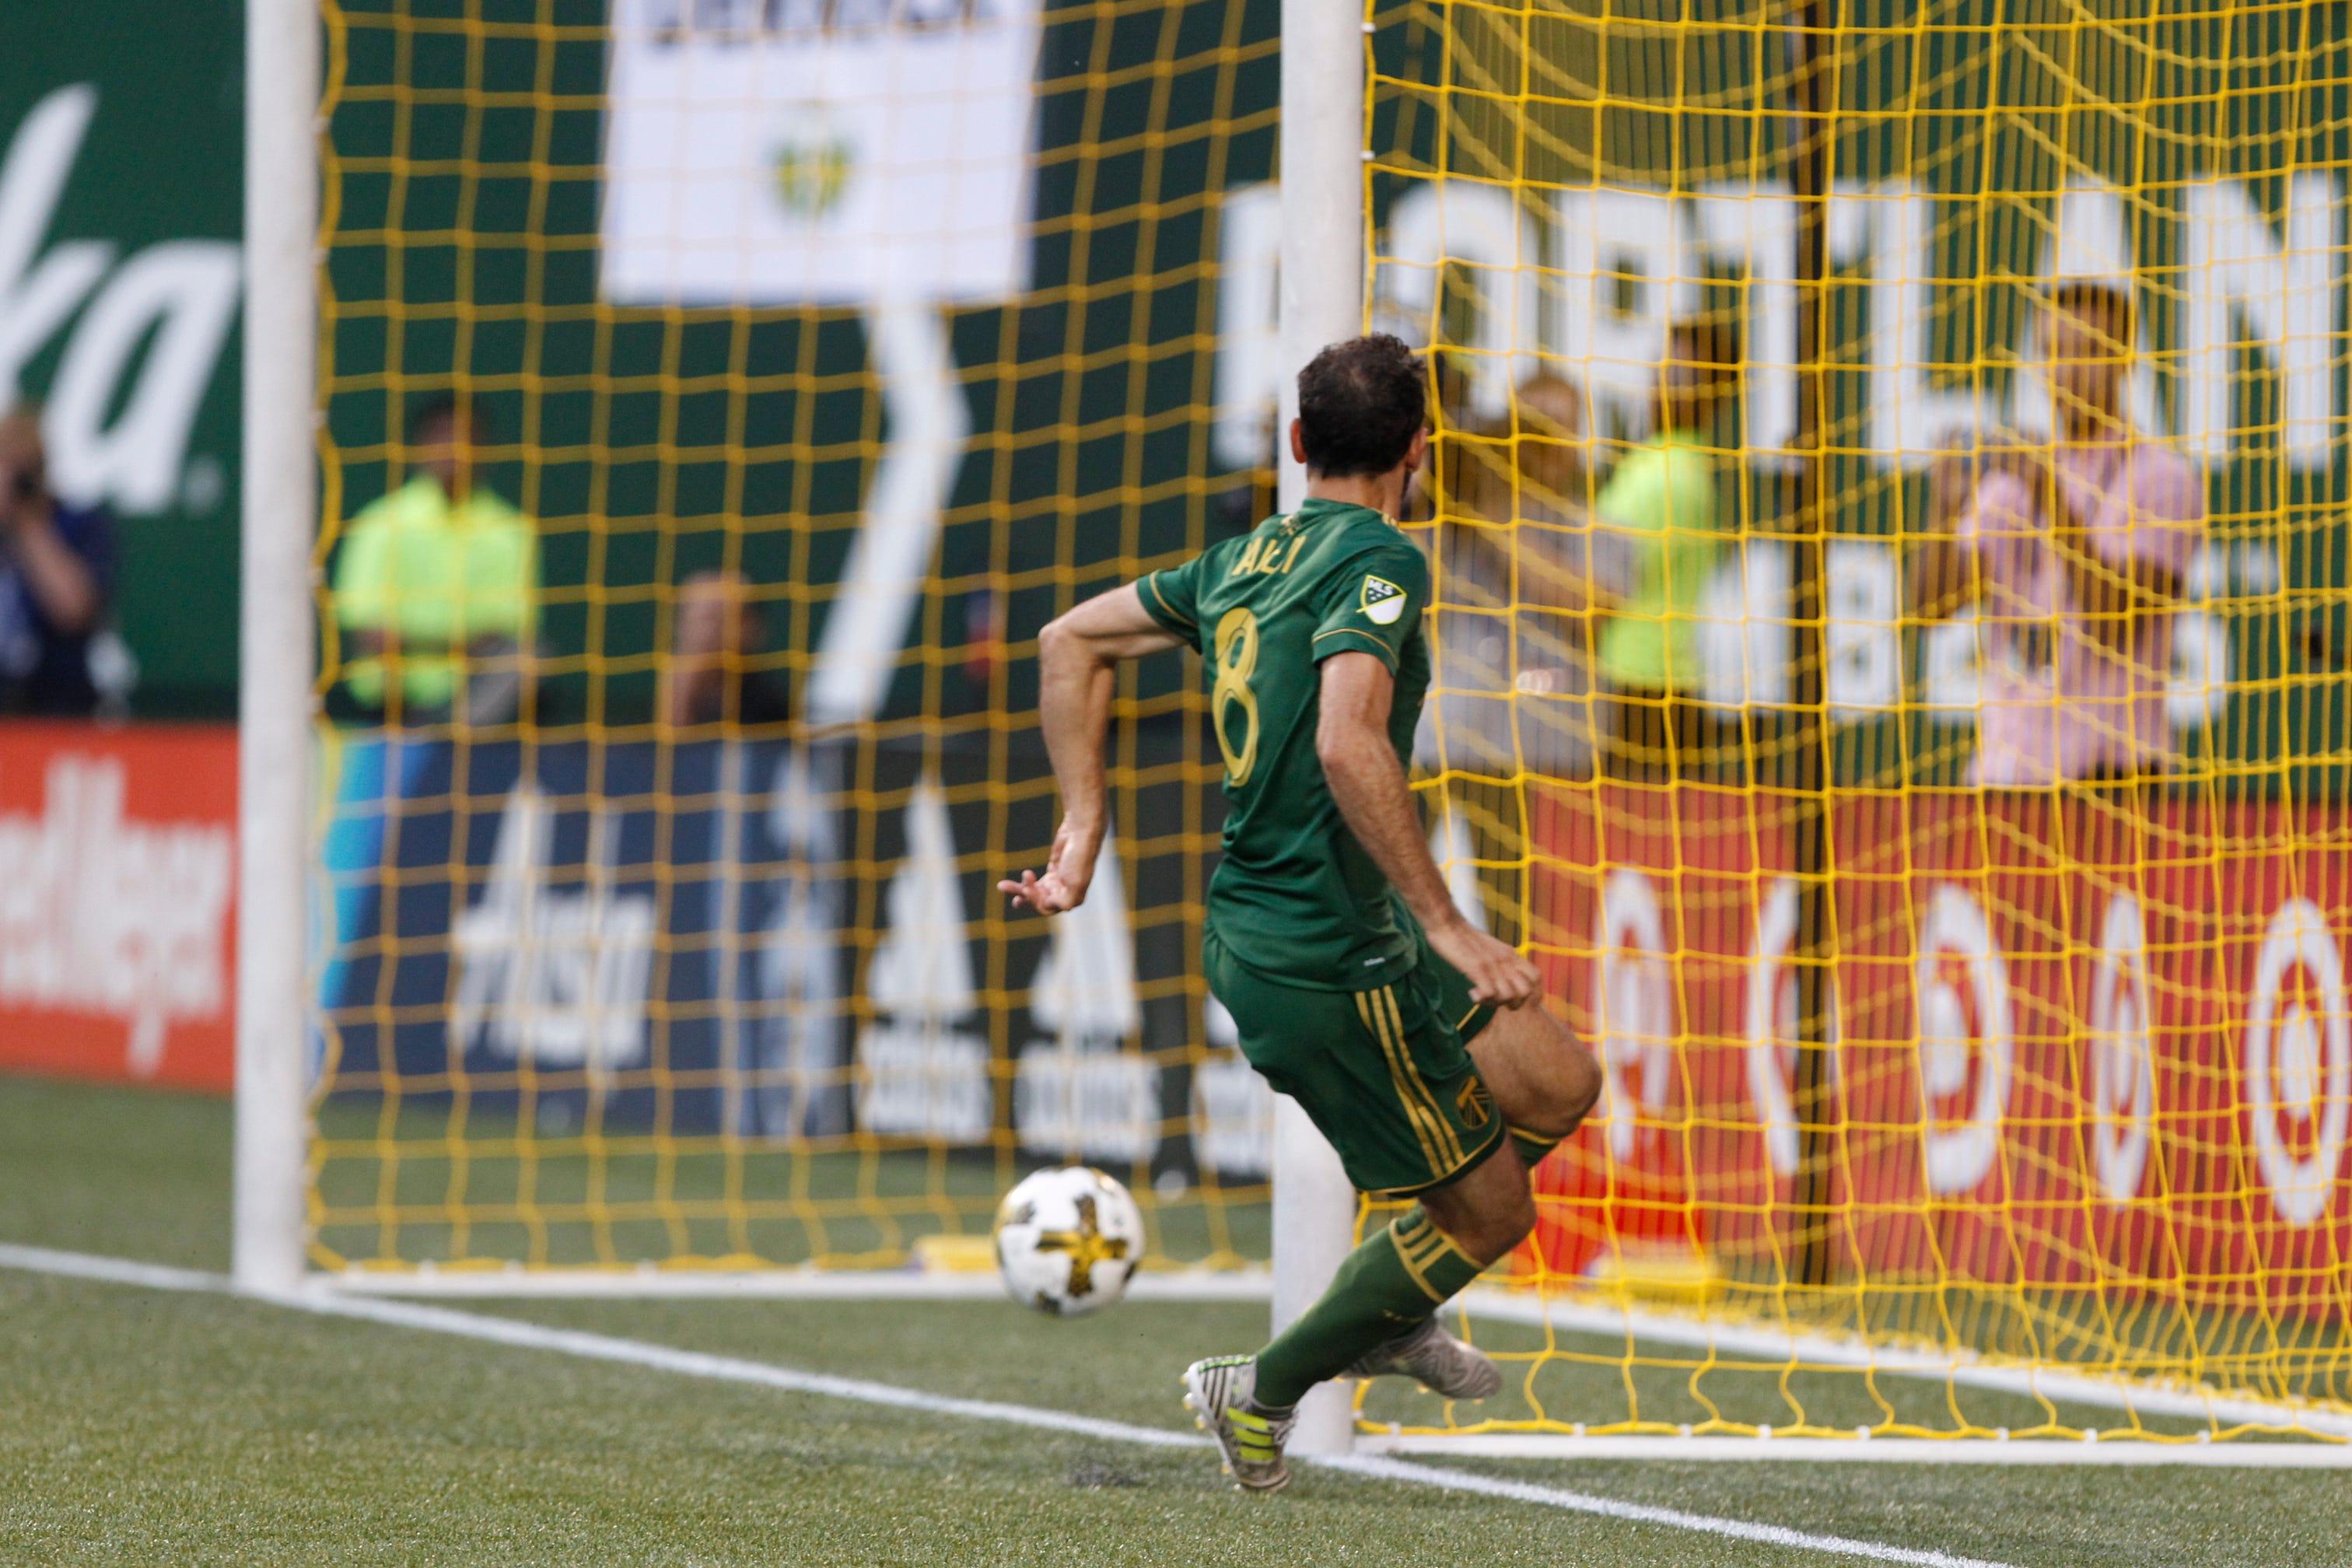 Valeri scores twice and Timbers beat Orlando City 3-0